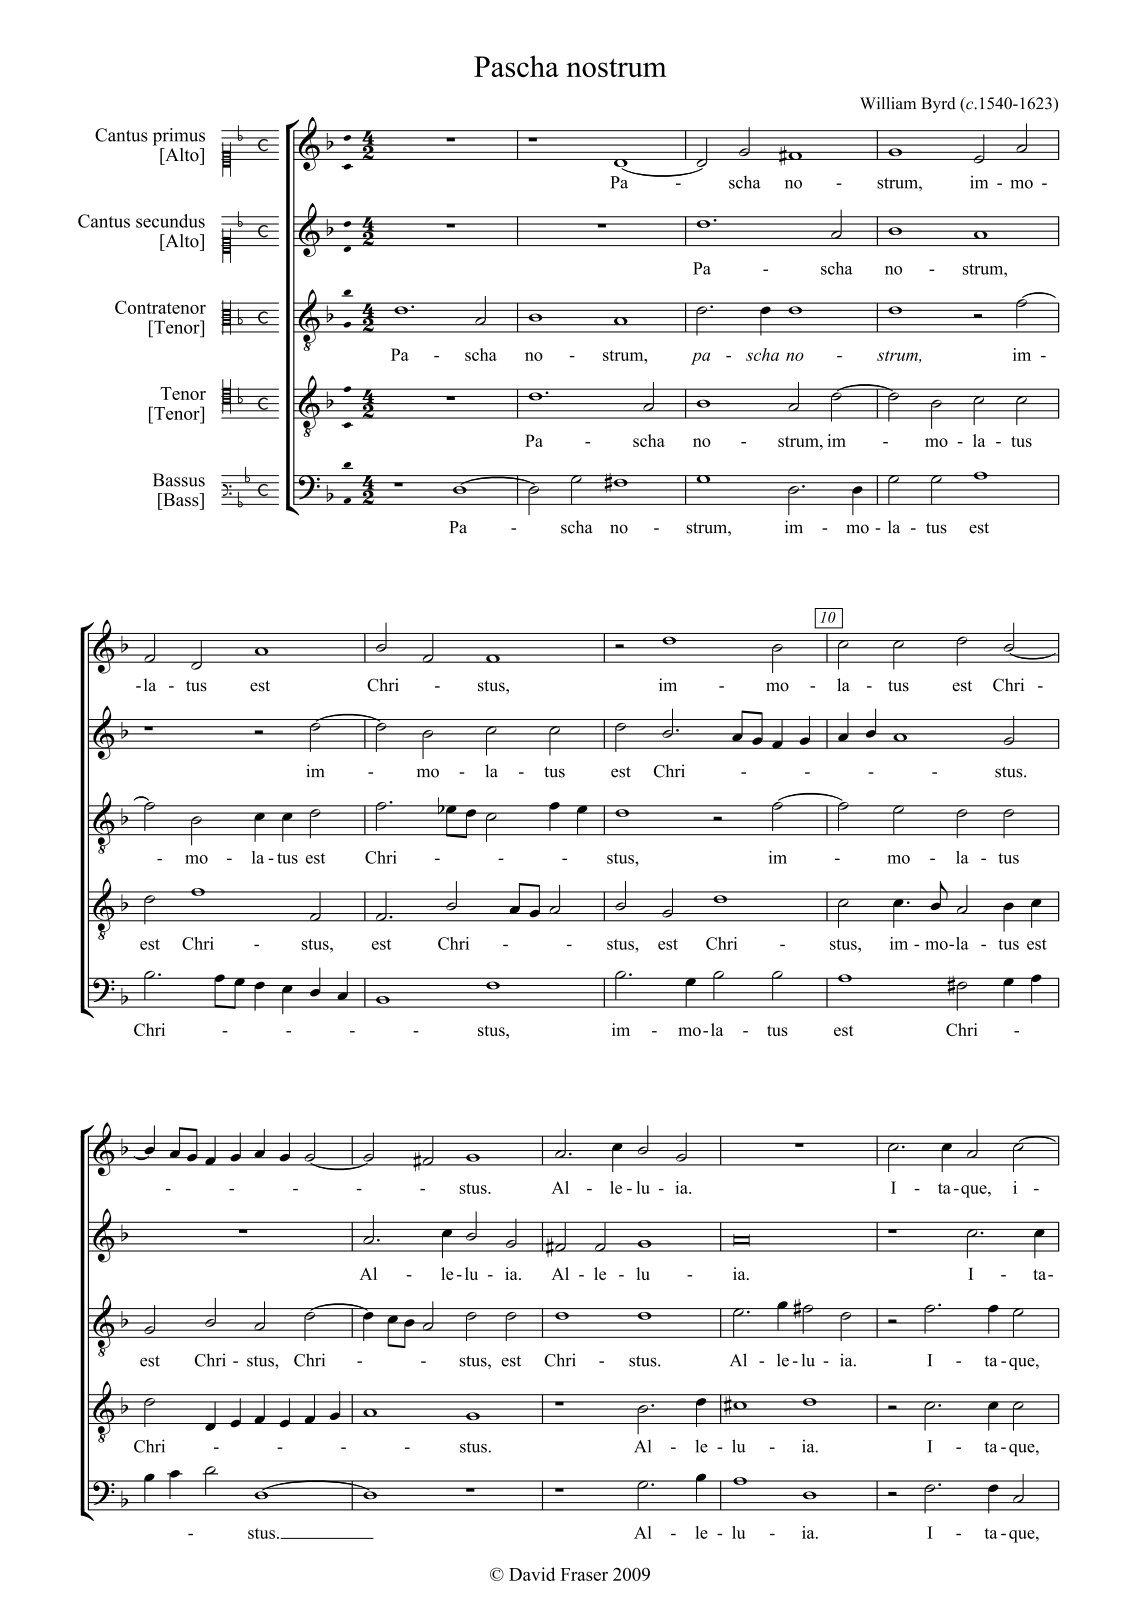 Public Domain Choral Sheet Music Www Cpdl Org